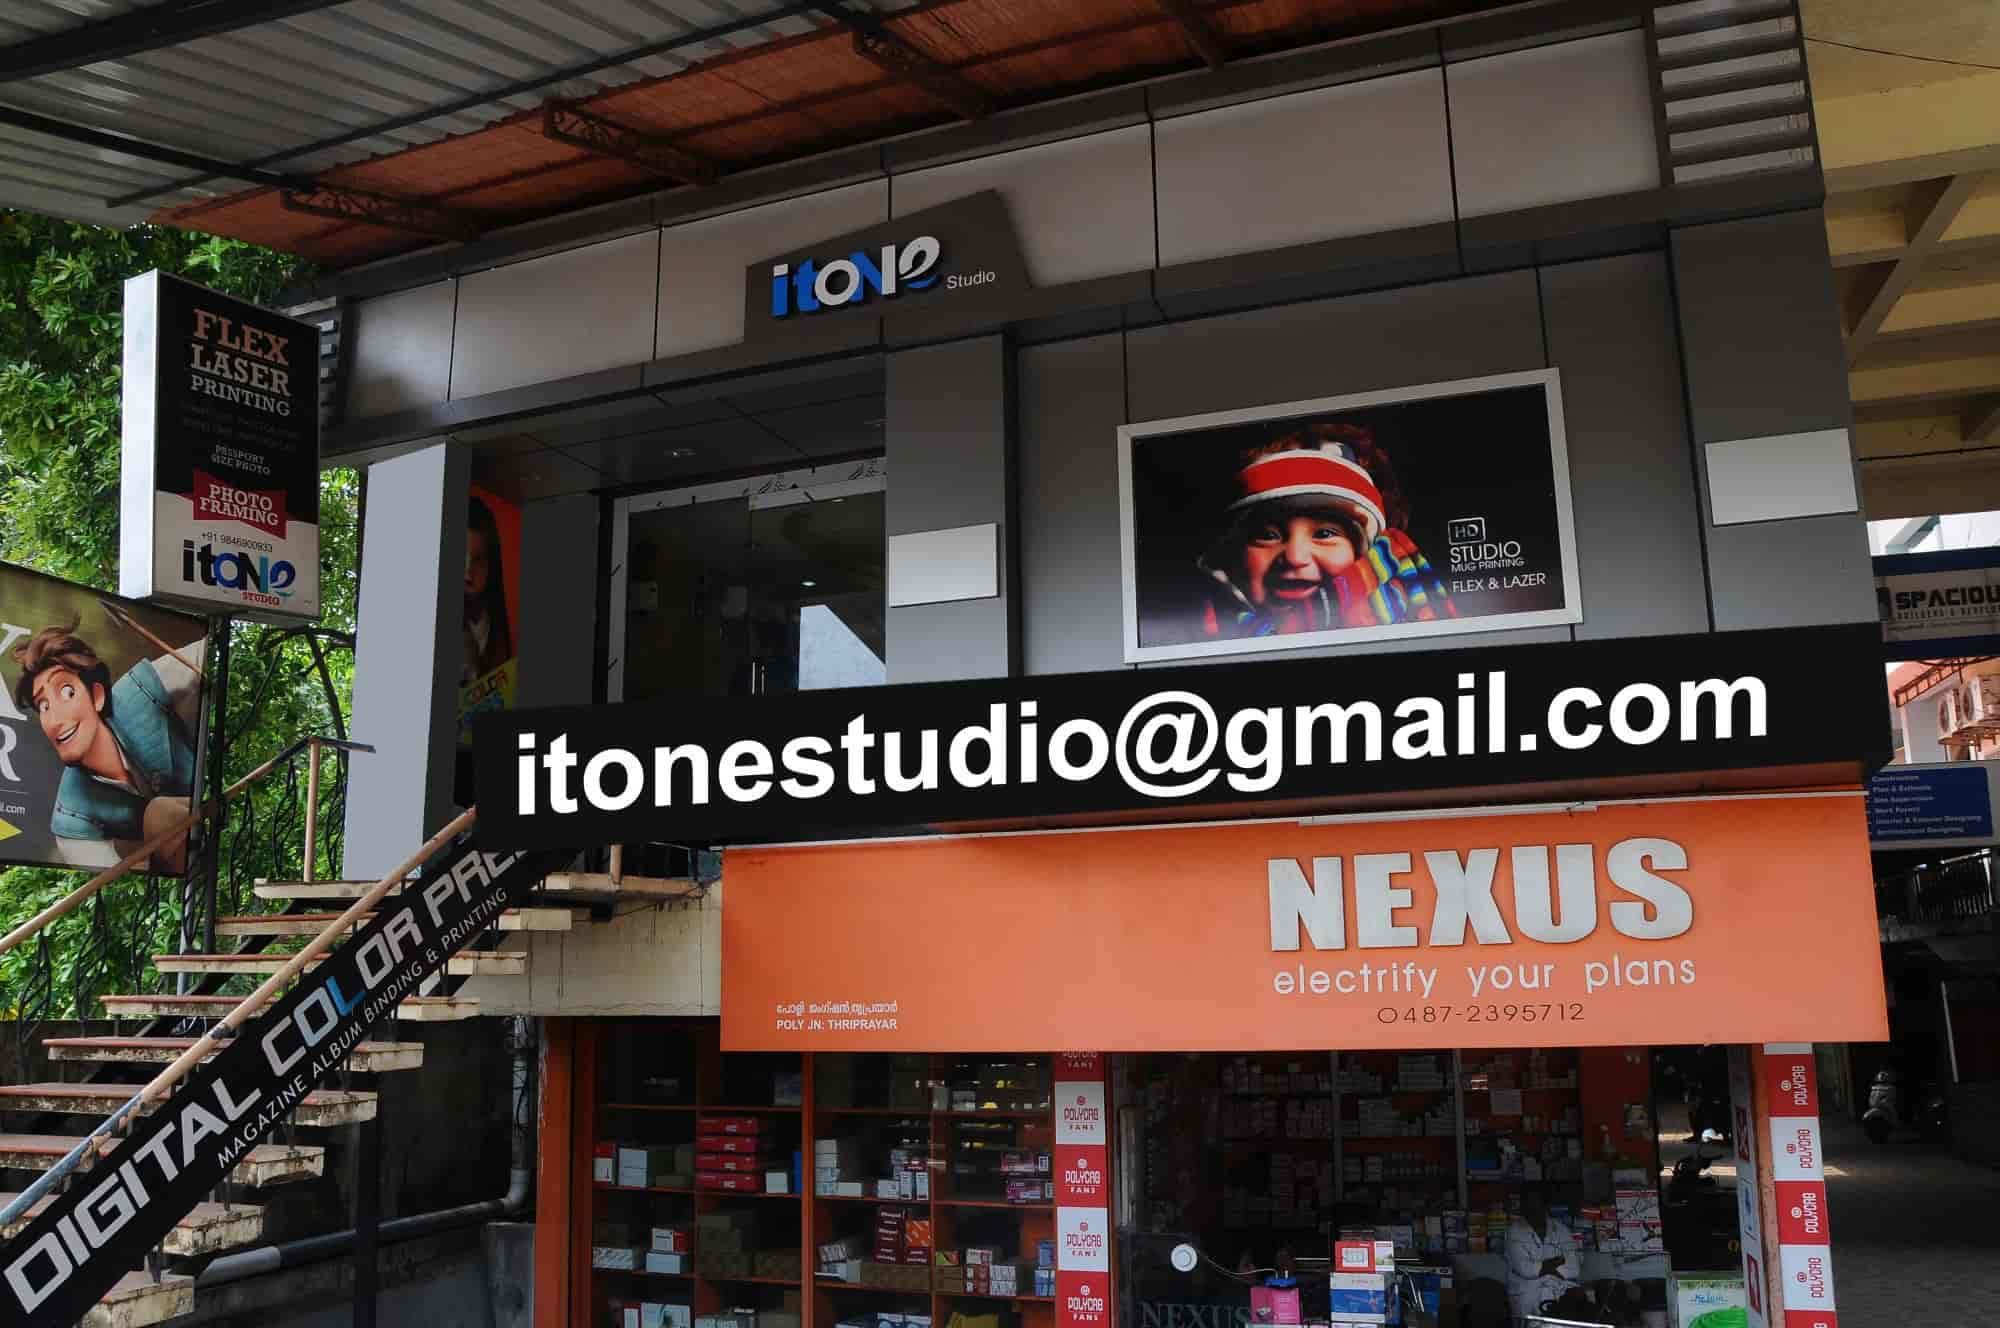 itone studio valapad flex printing services in thrissur justdial itone studio valapad flex printing